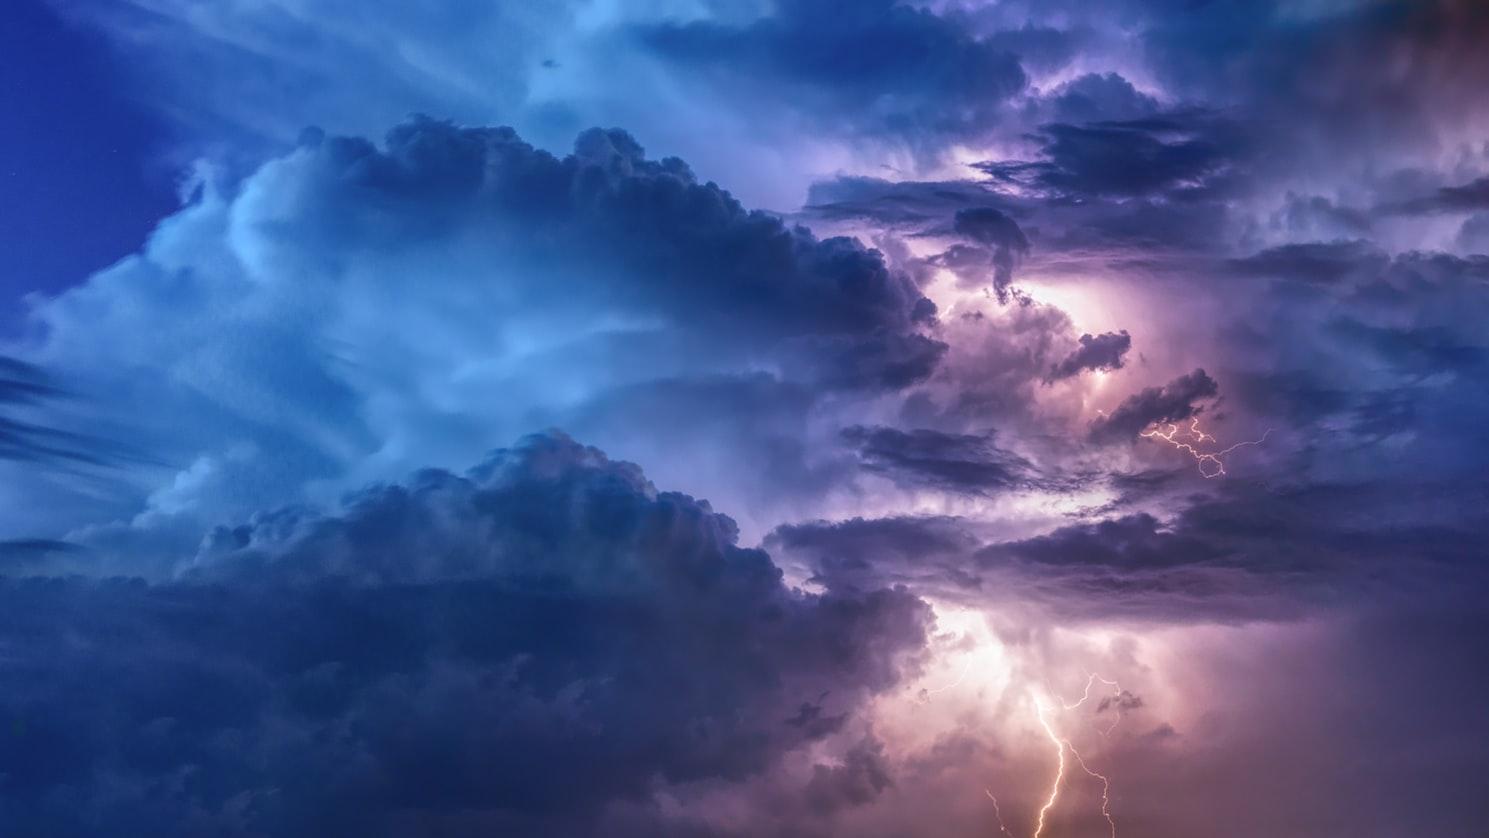 thunderstorm poetry